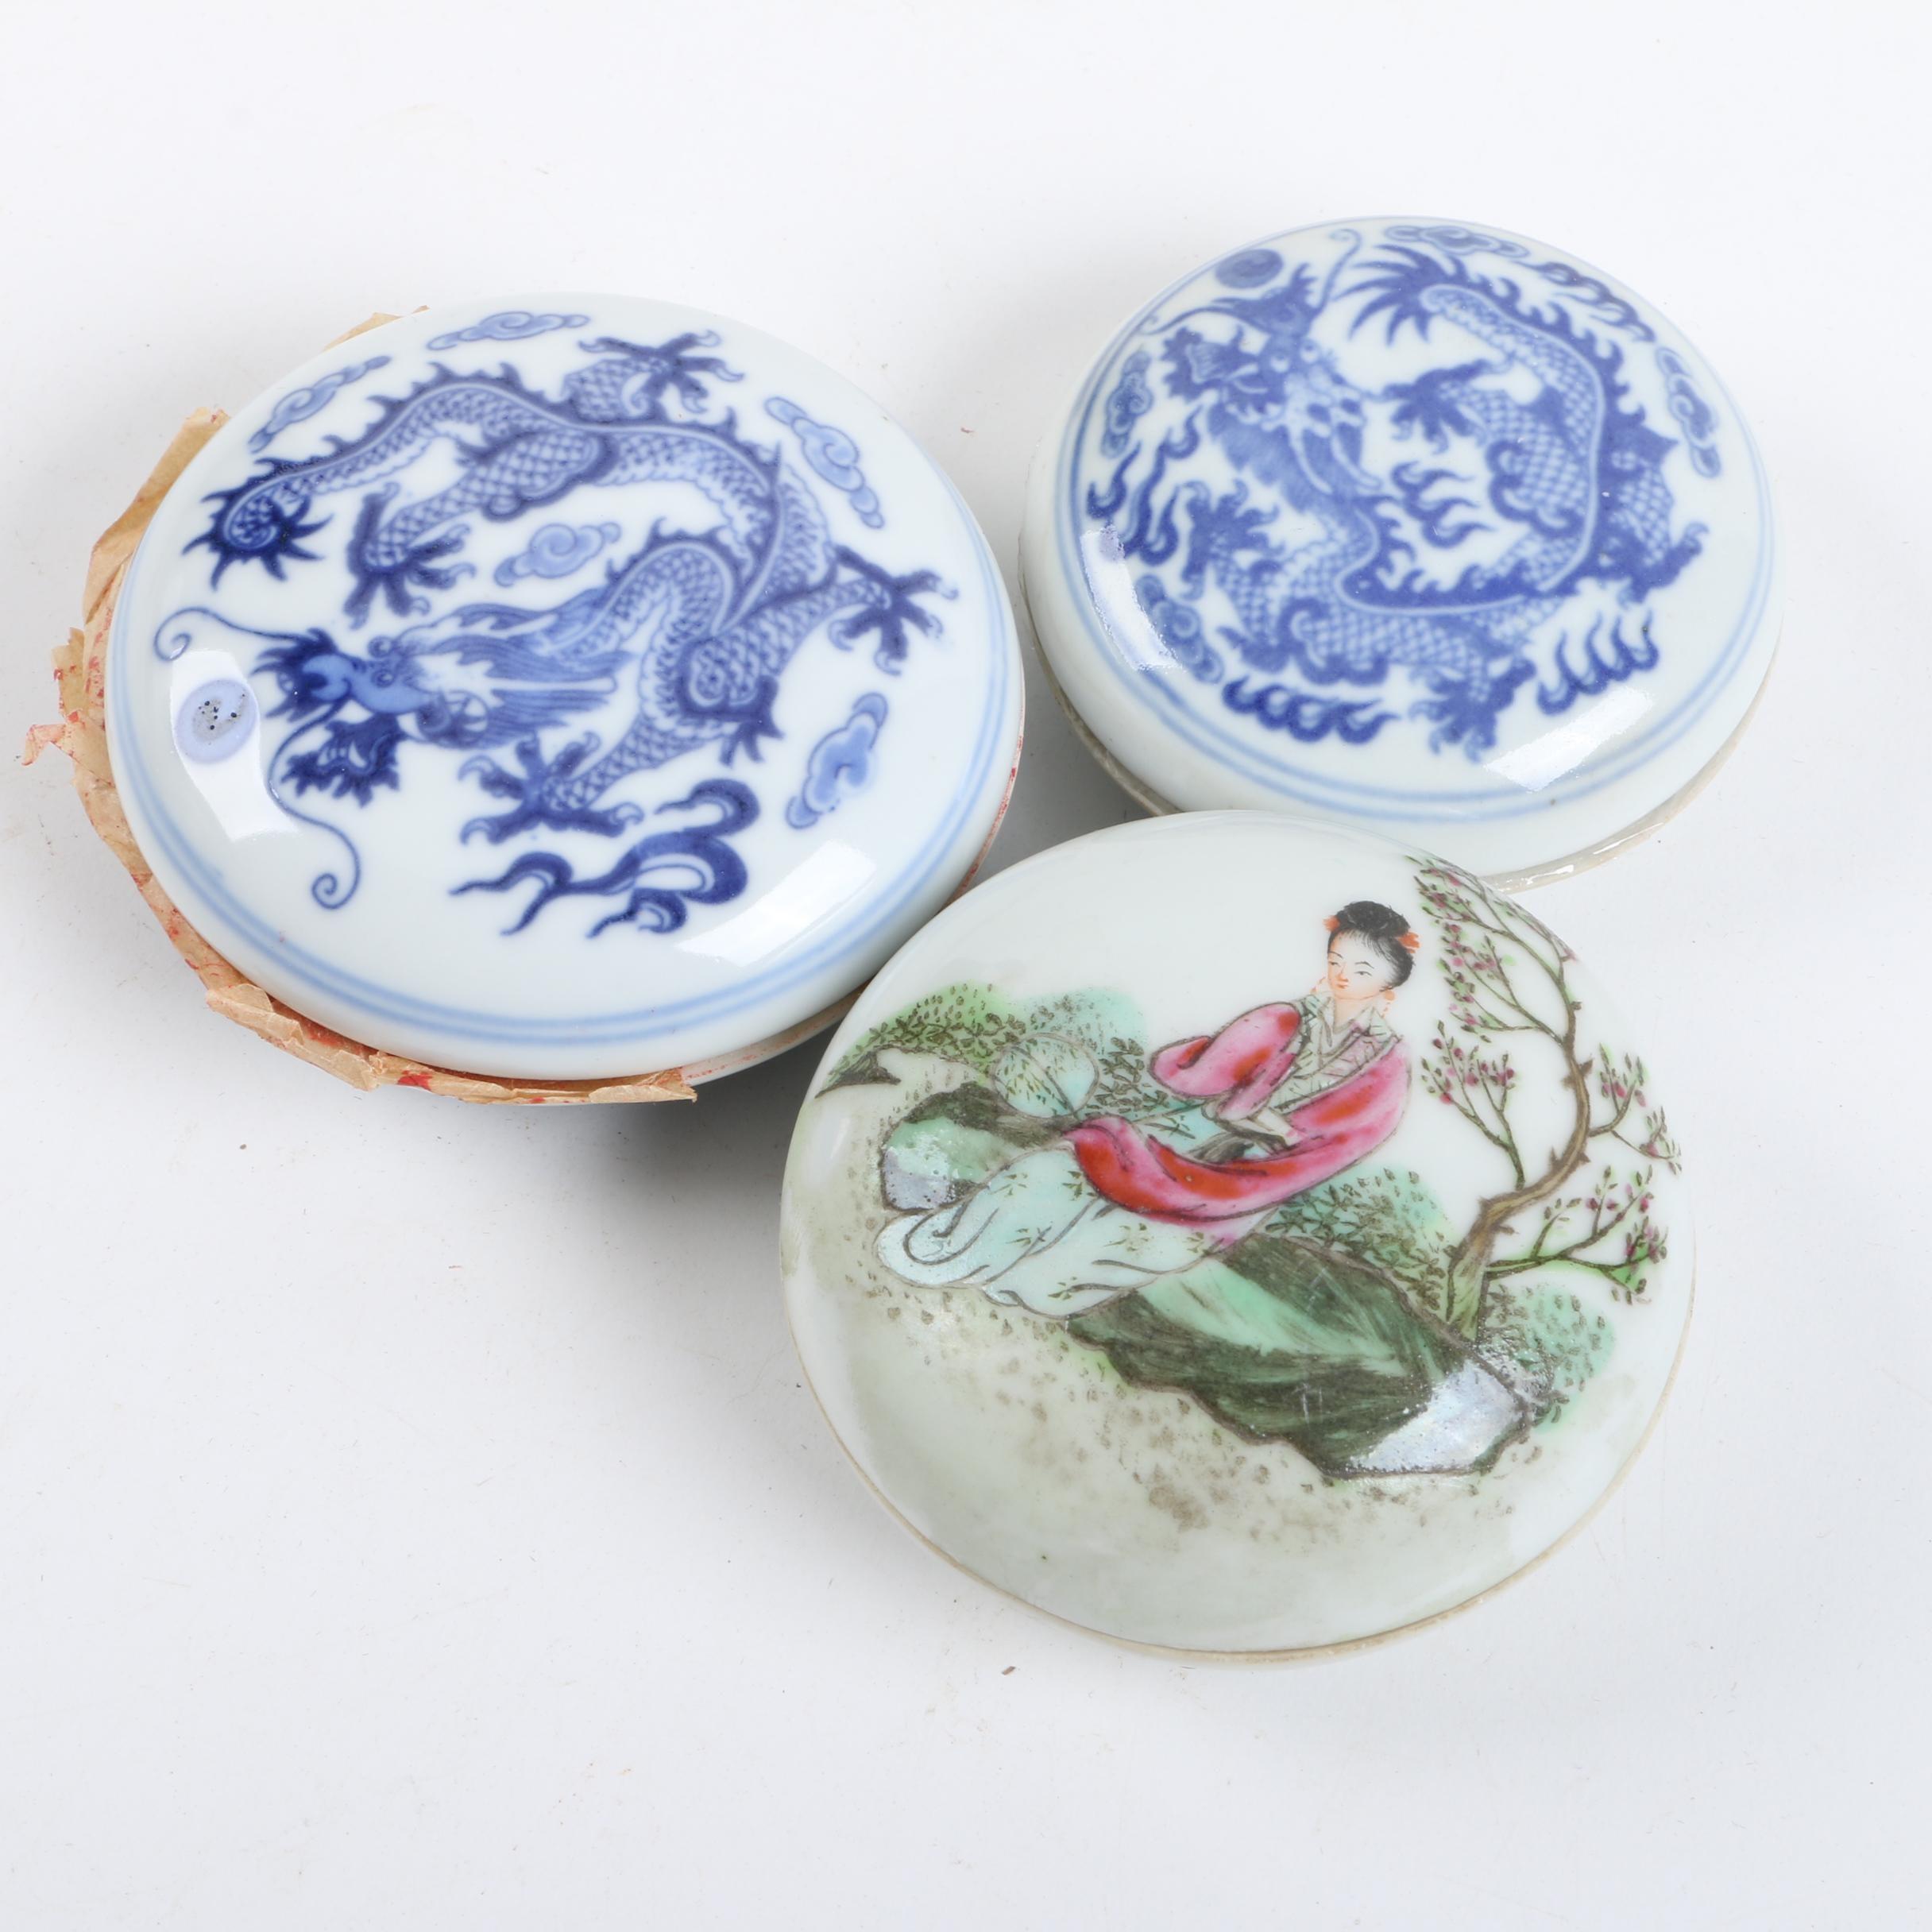 East Asian Style Ceramic Paint Jars